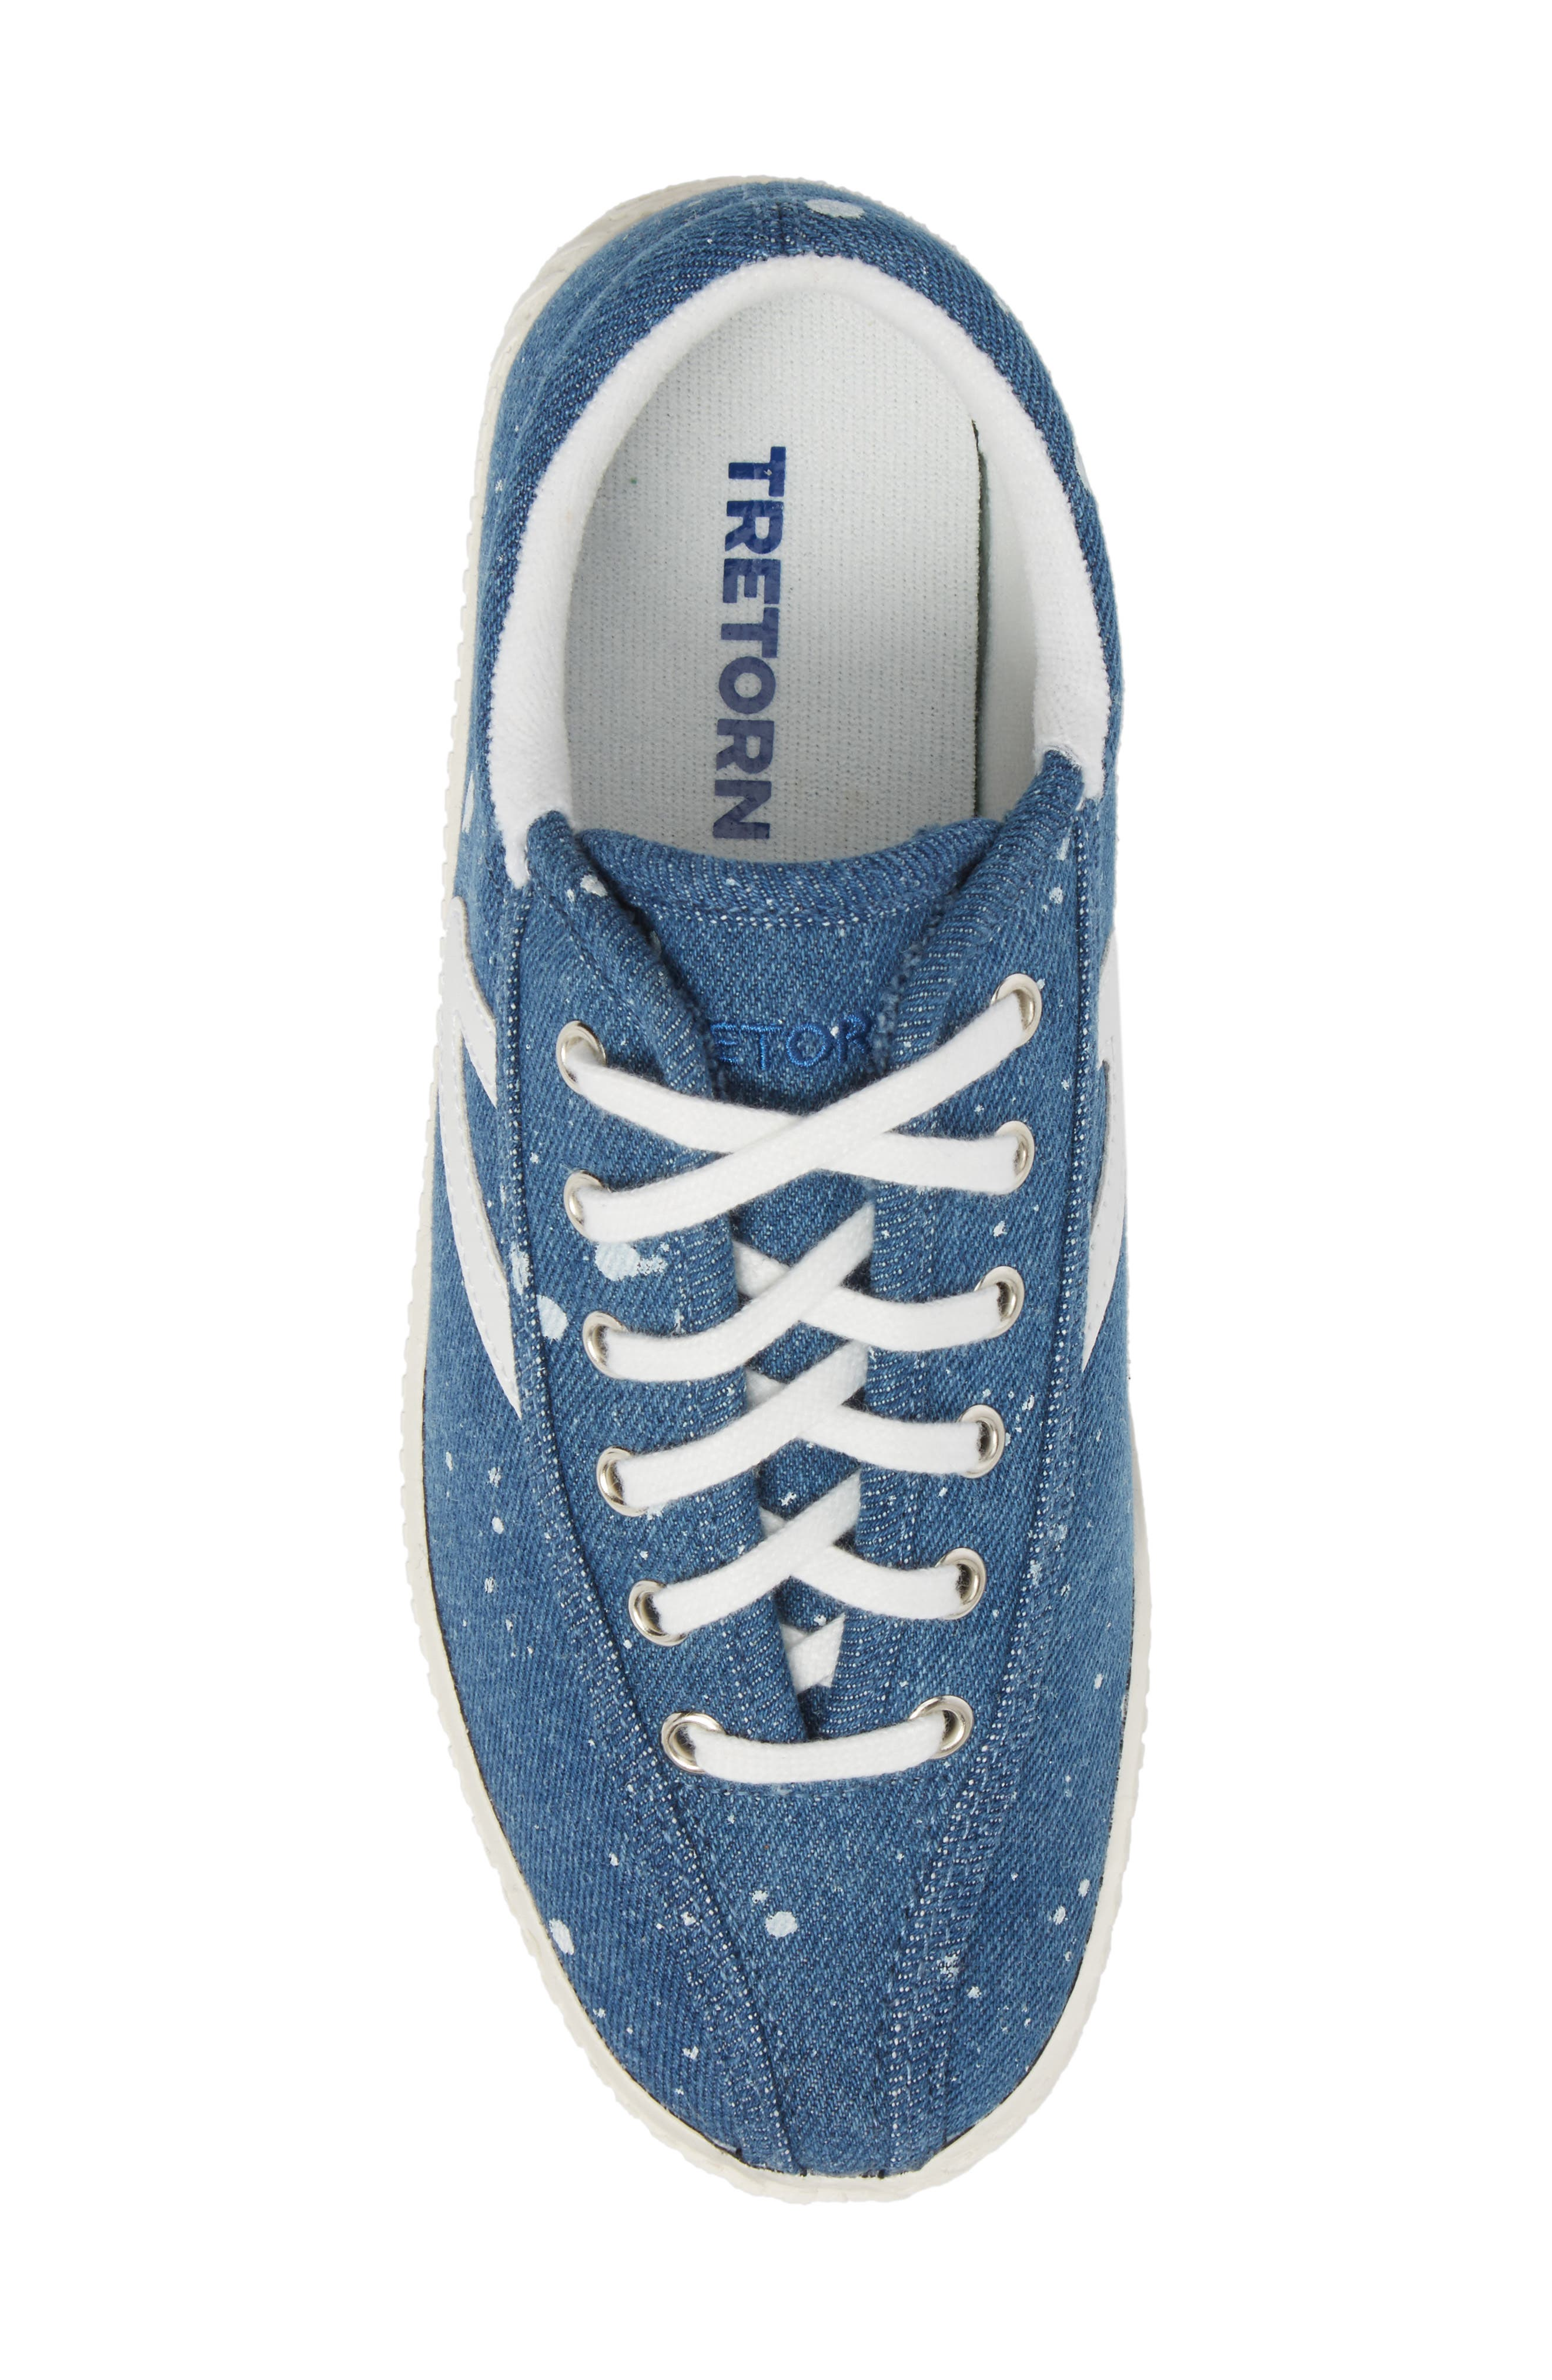 Nylite Plus Sneaker,                             Alternate thumbnail 5, color,                             Blue Fabric